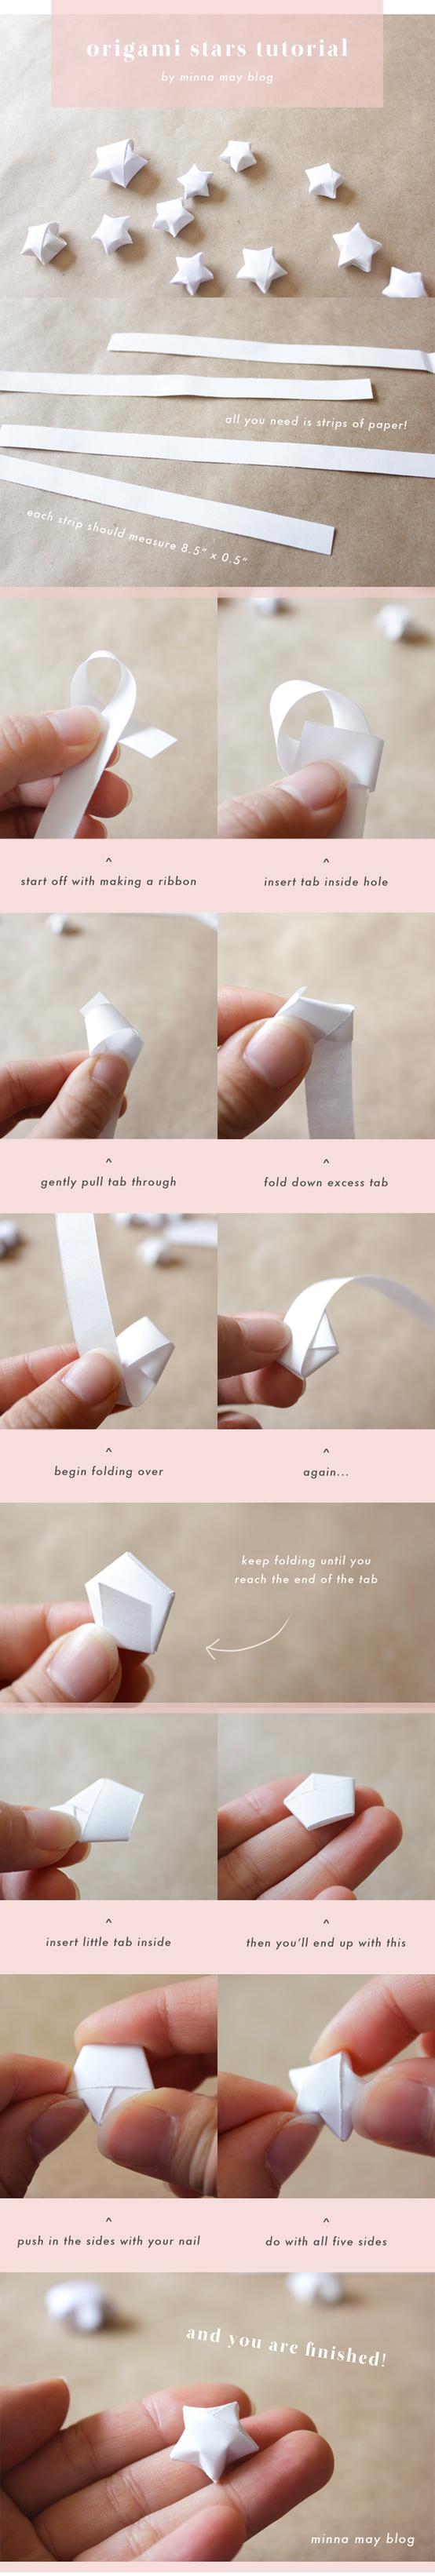 origami-stars-tutorial